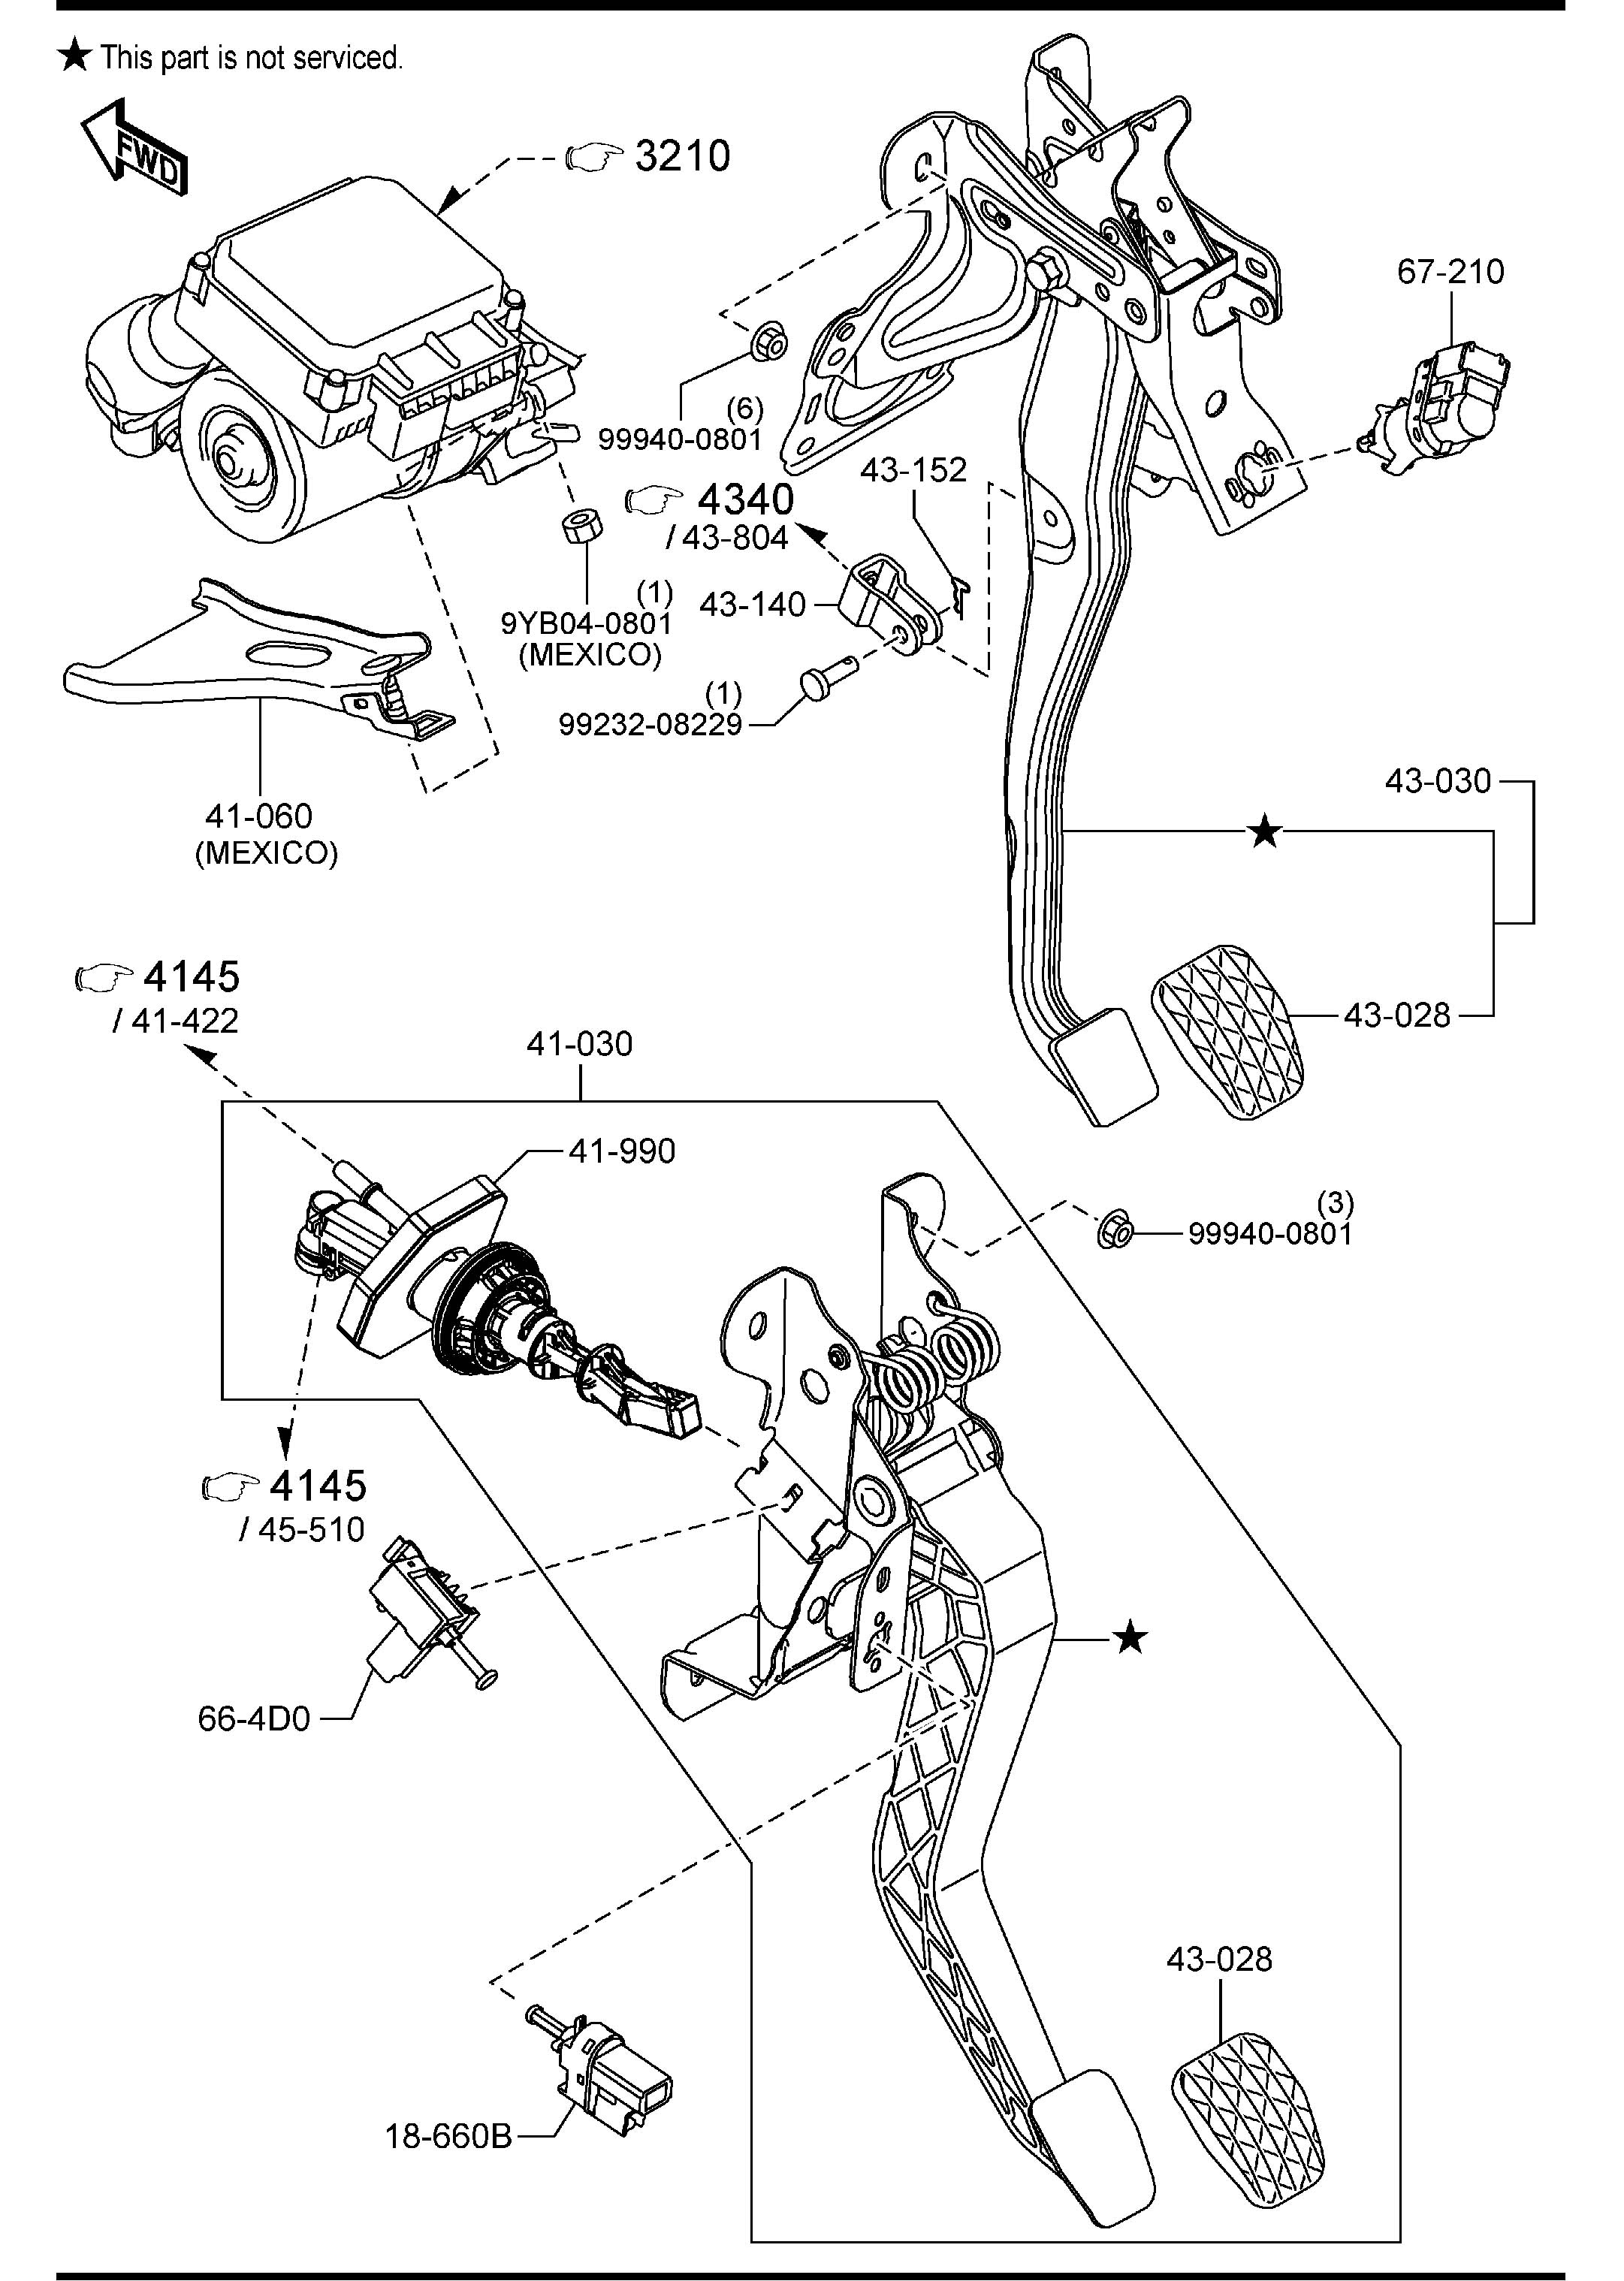 2002 toyota corolla belt diagram leeson 3 hp motor wiring 00 serpentine imageresizertool com